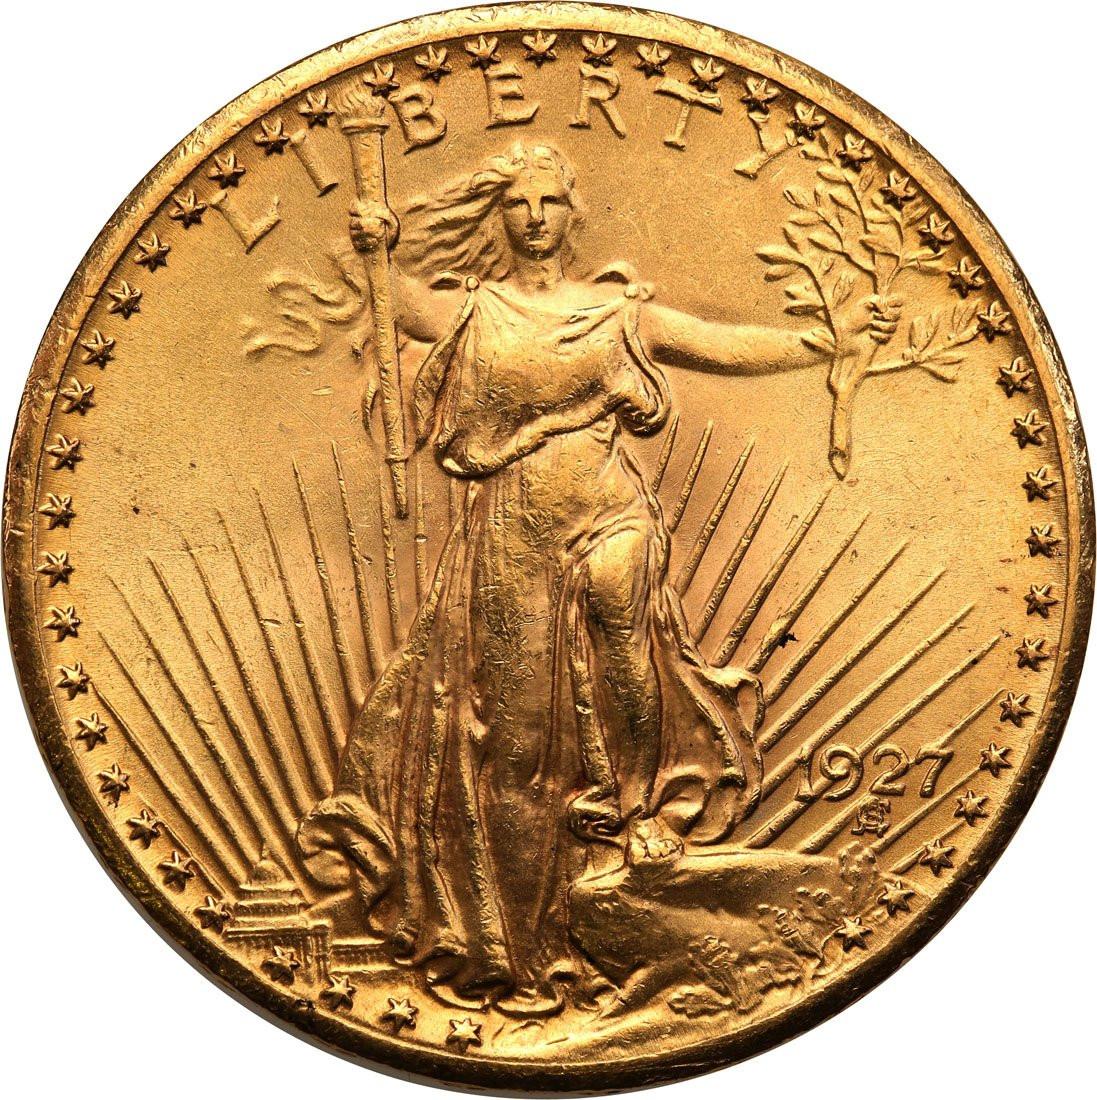 USA. 20 dolarów Saint Gaudens 1927